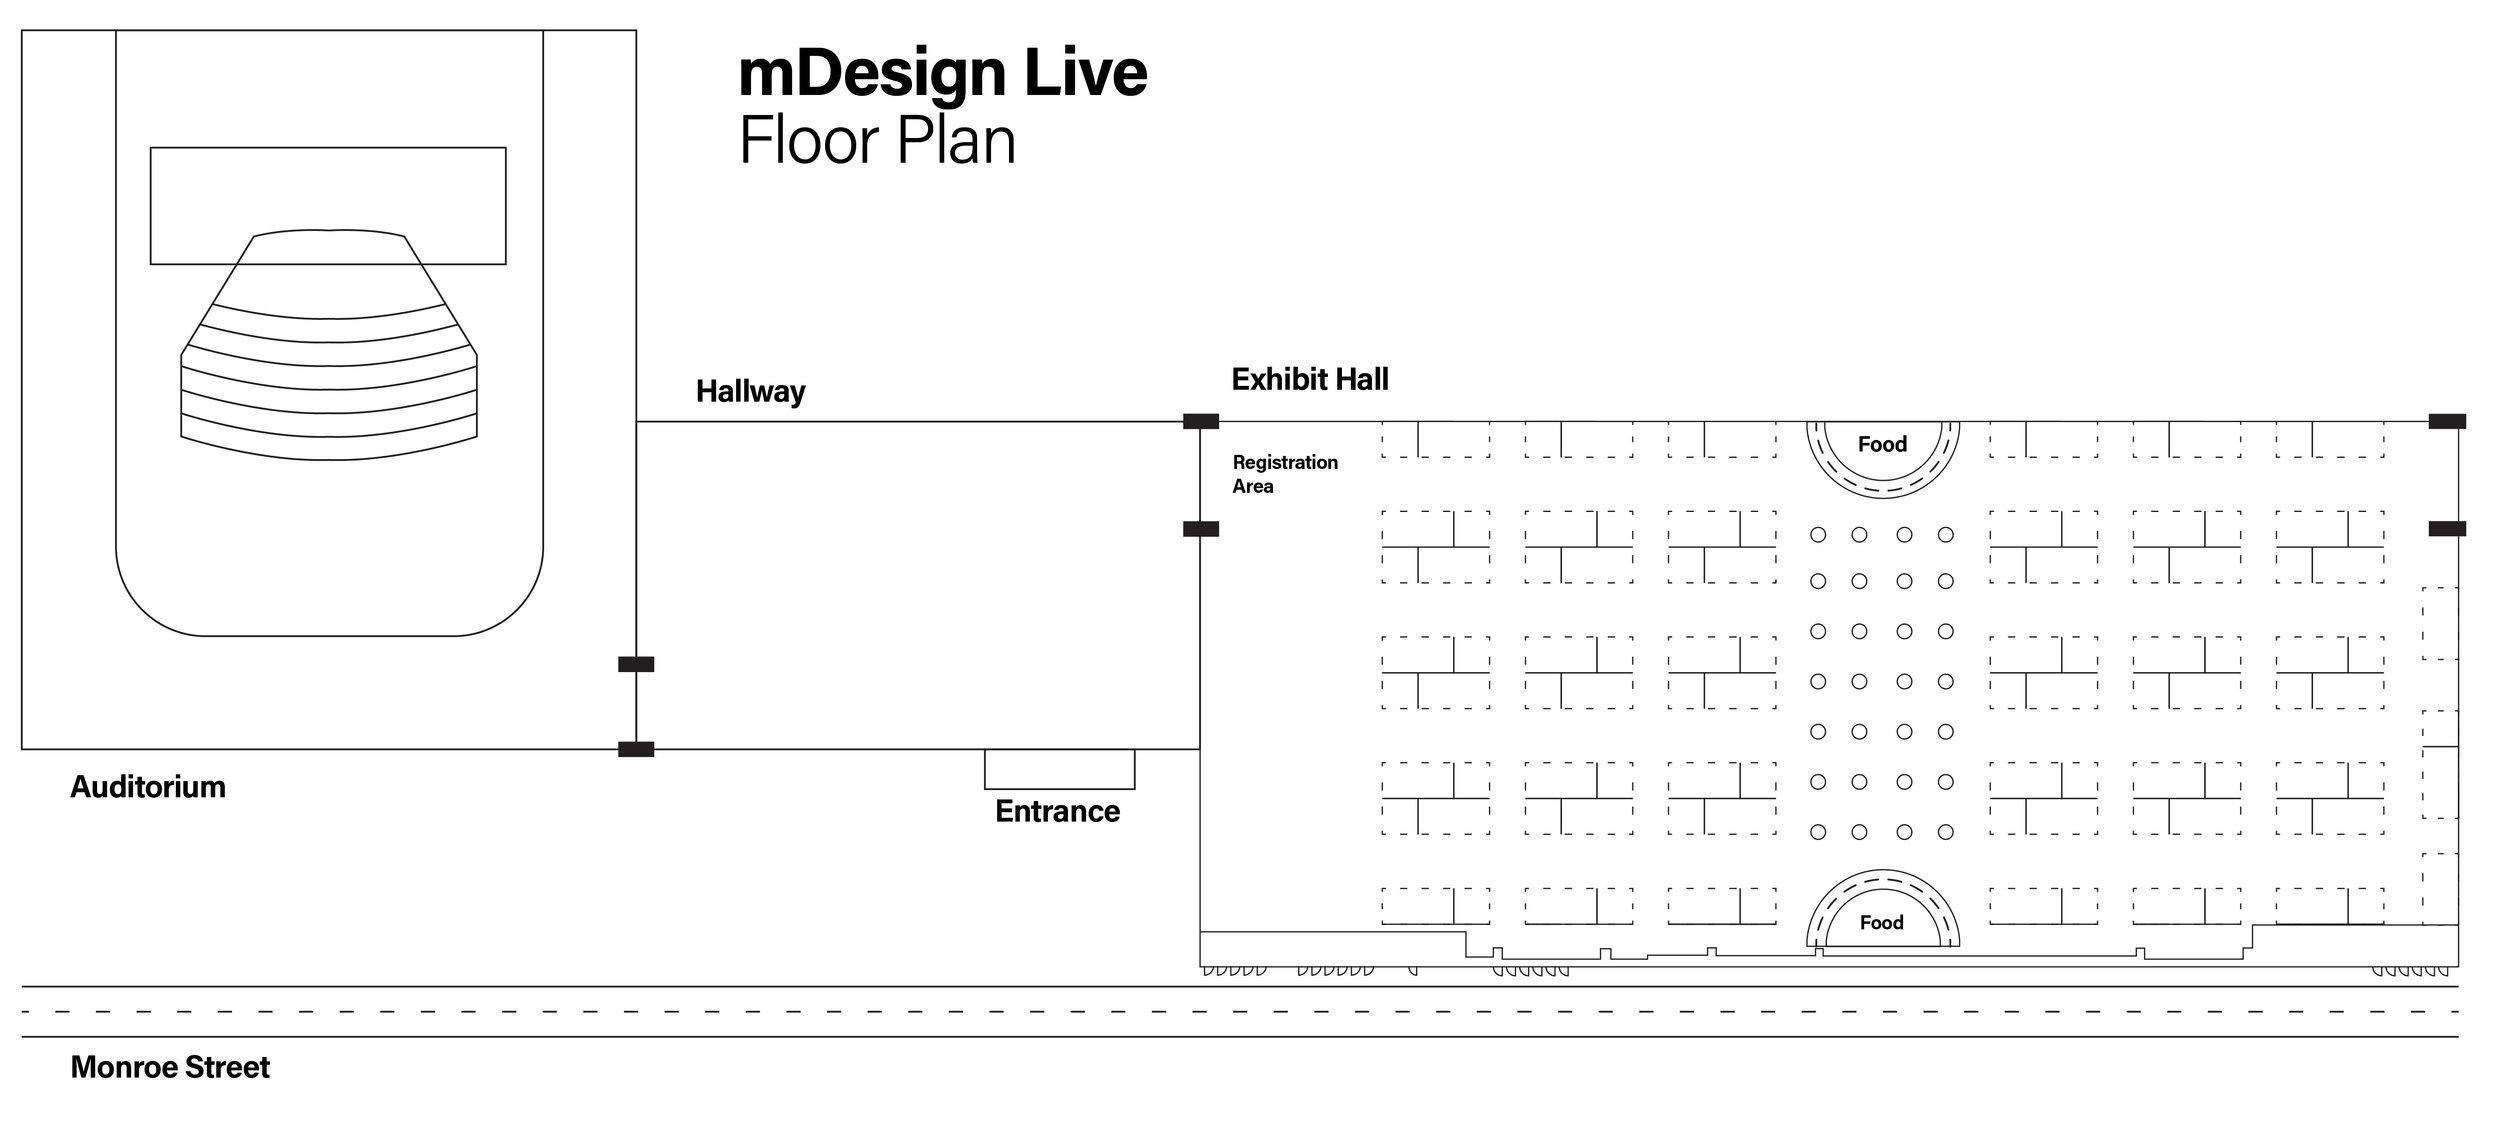 mDesign Live Floor Plan-06.jpg